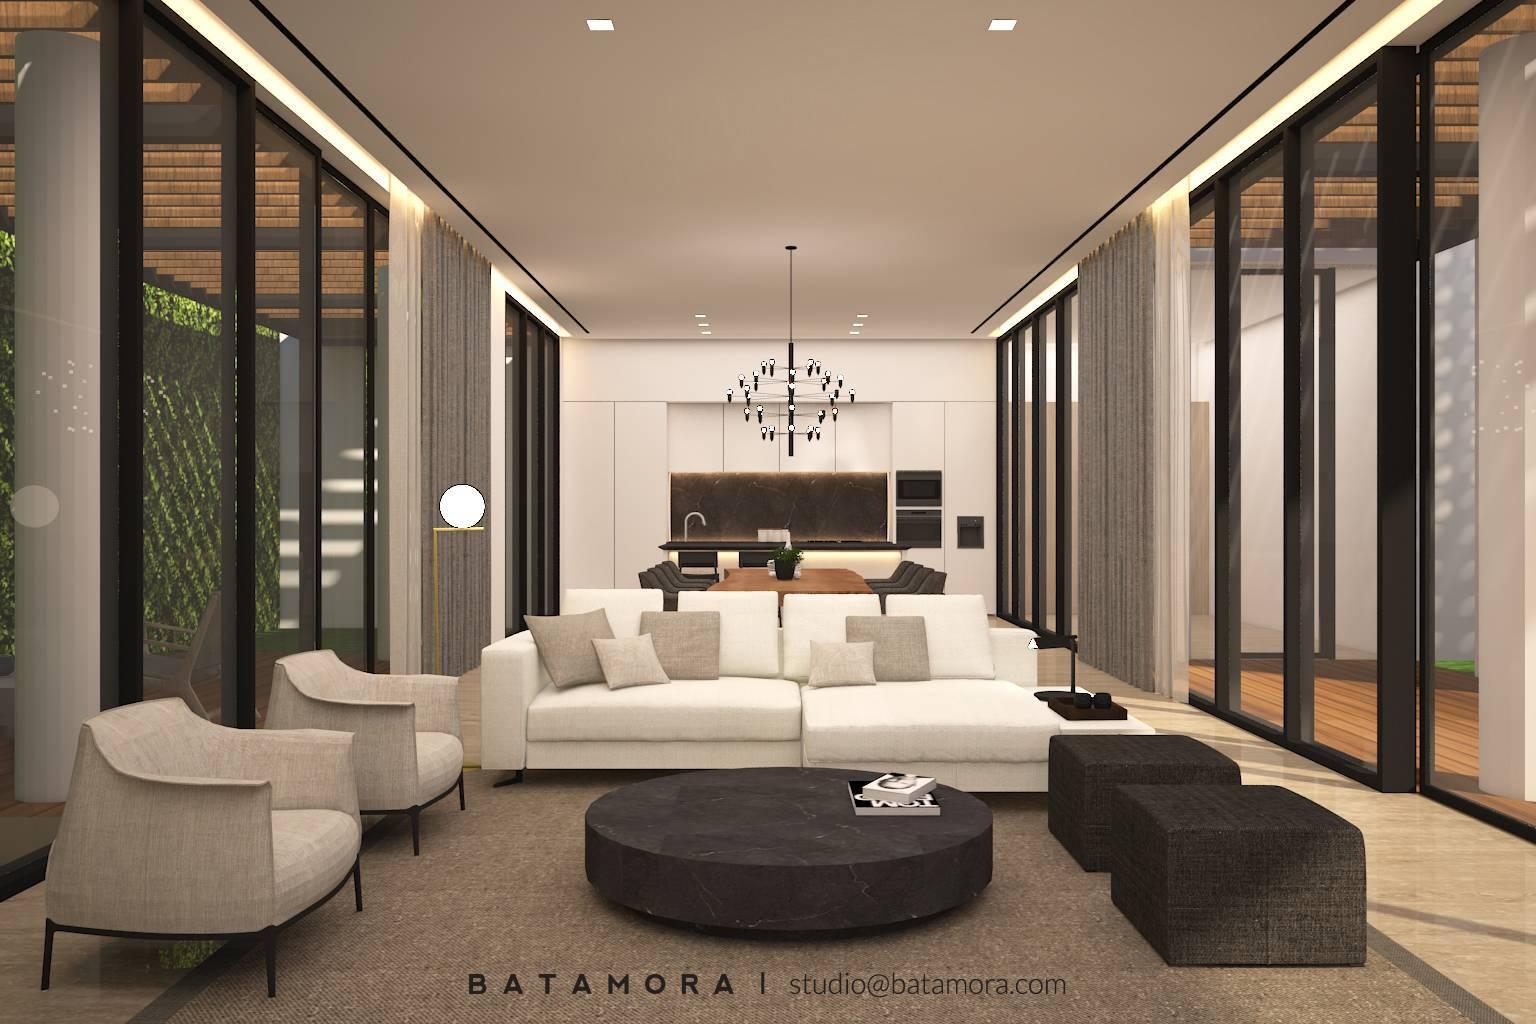 Batamora Martimbang House At Kebayoran Baru Jakarta Jakarta Living-Room   2694